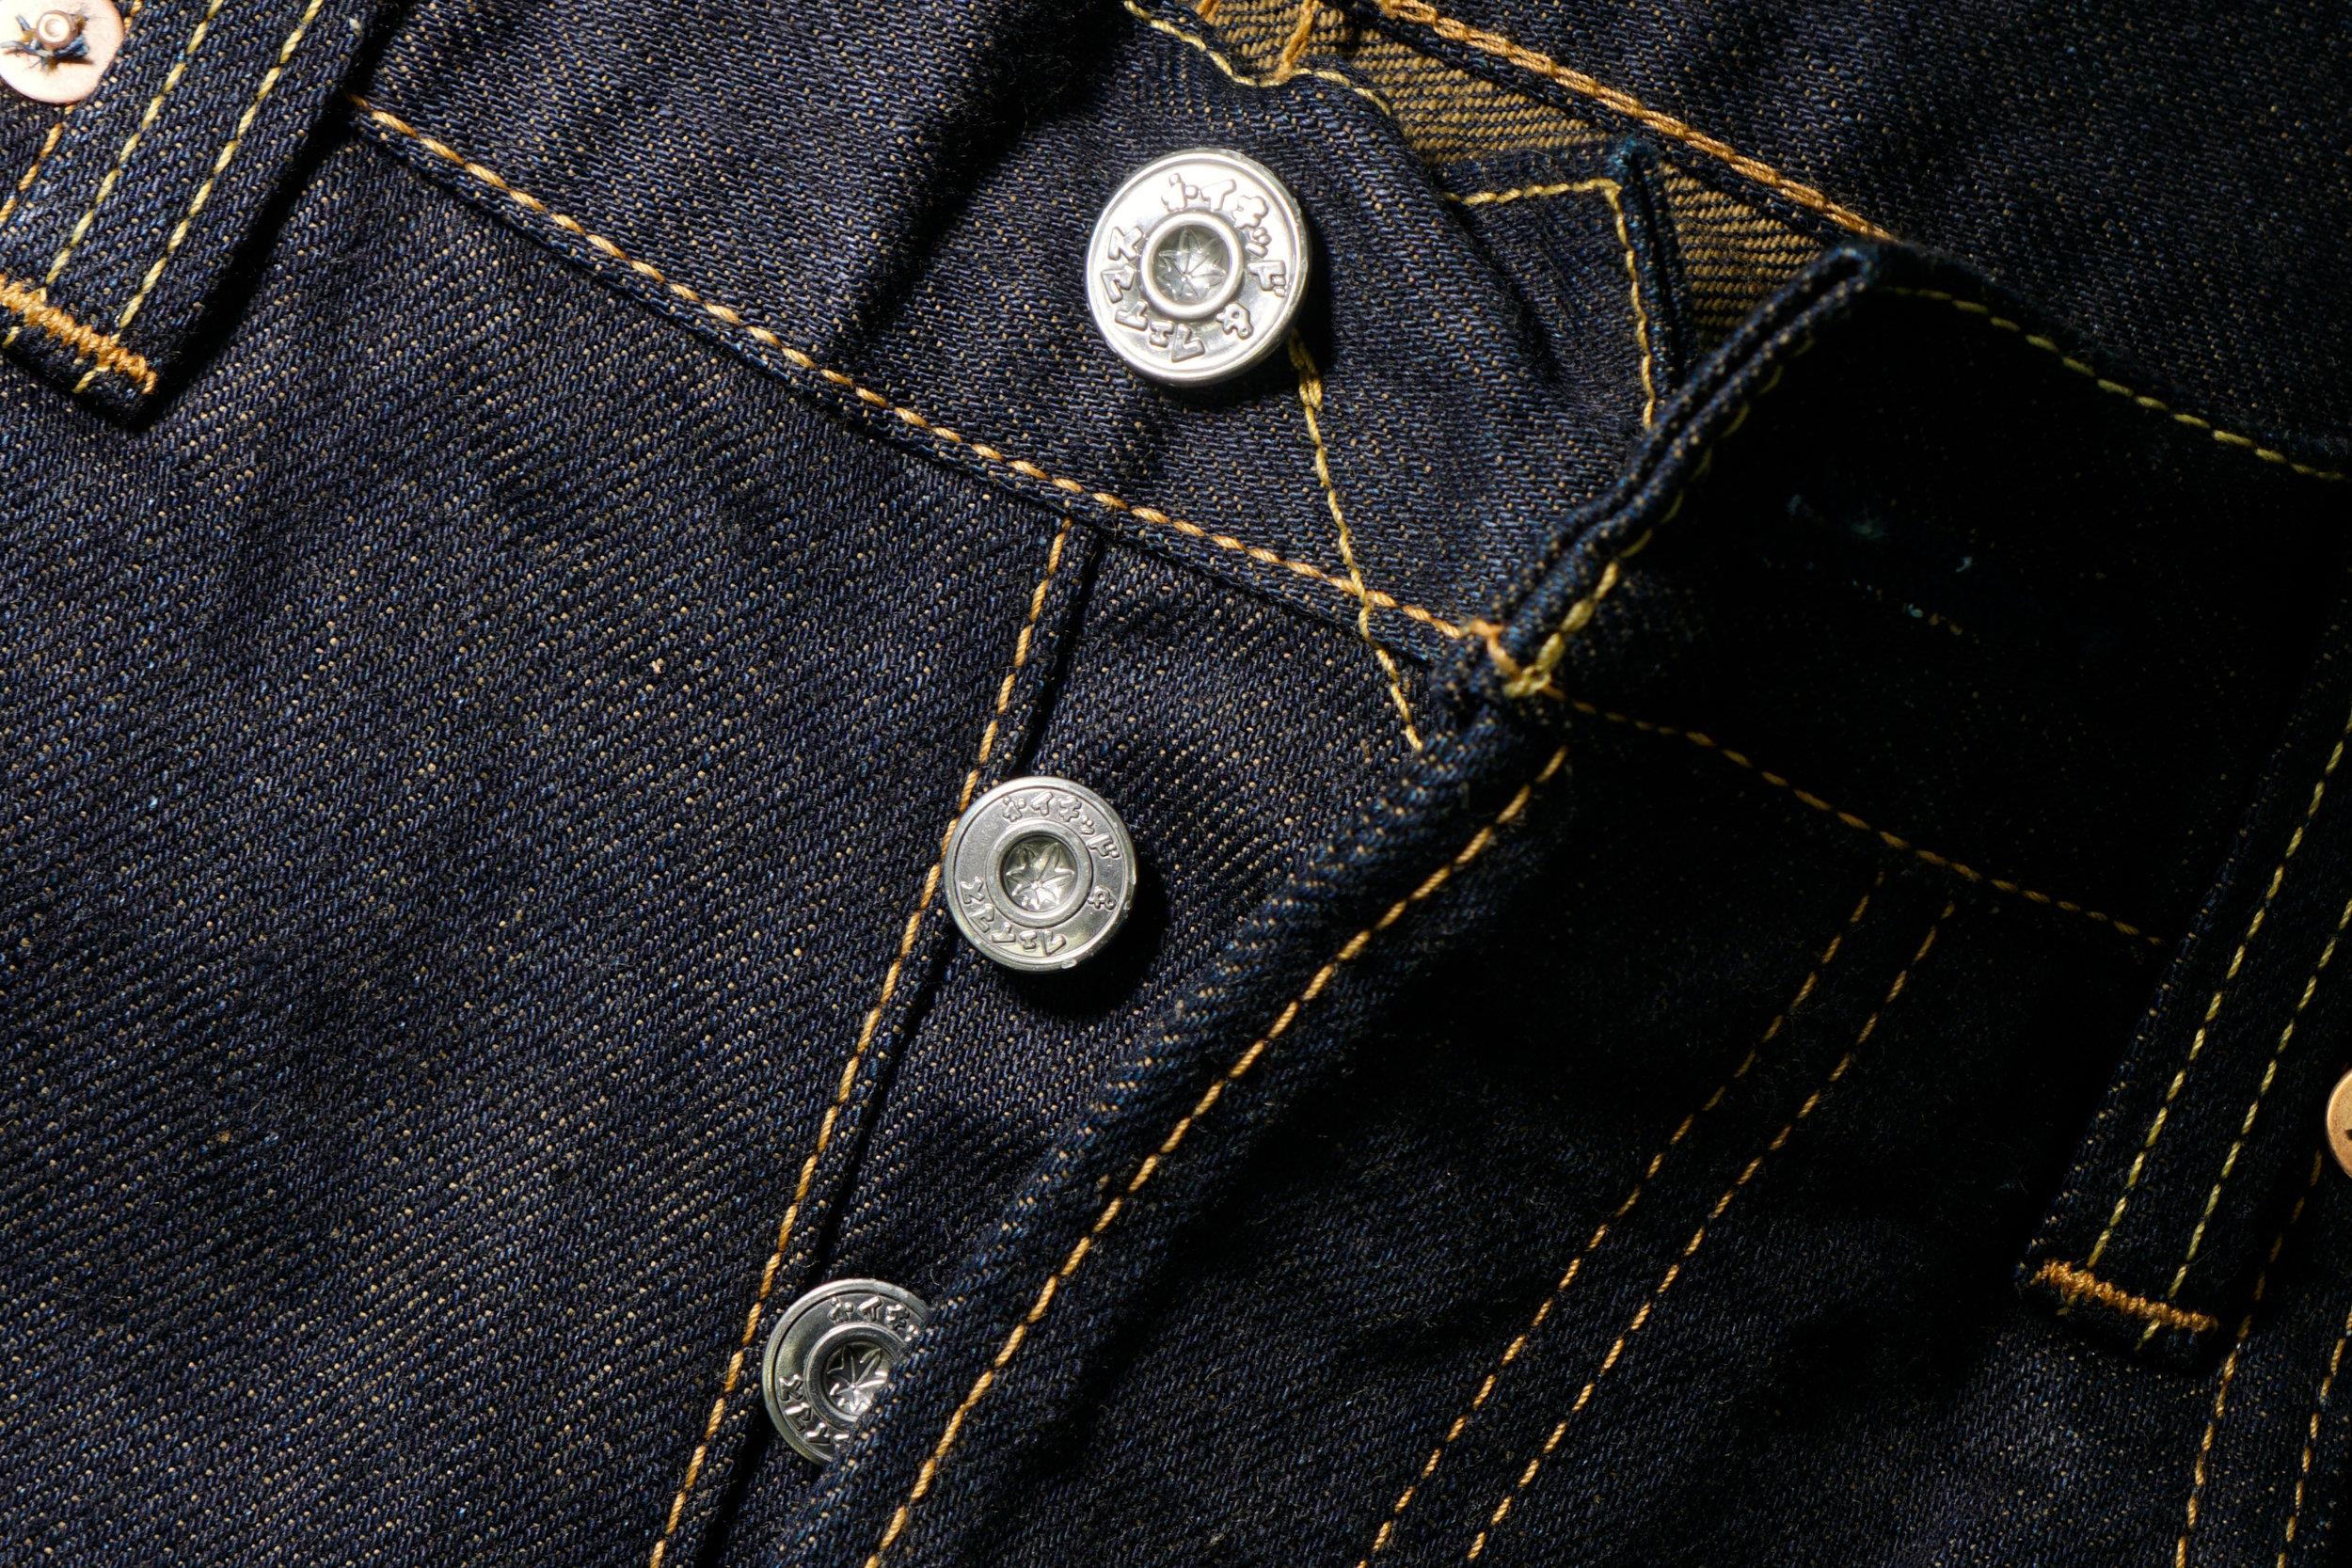 MIJ5 Kogare Kakishibu - Iron Fly Buttons